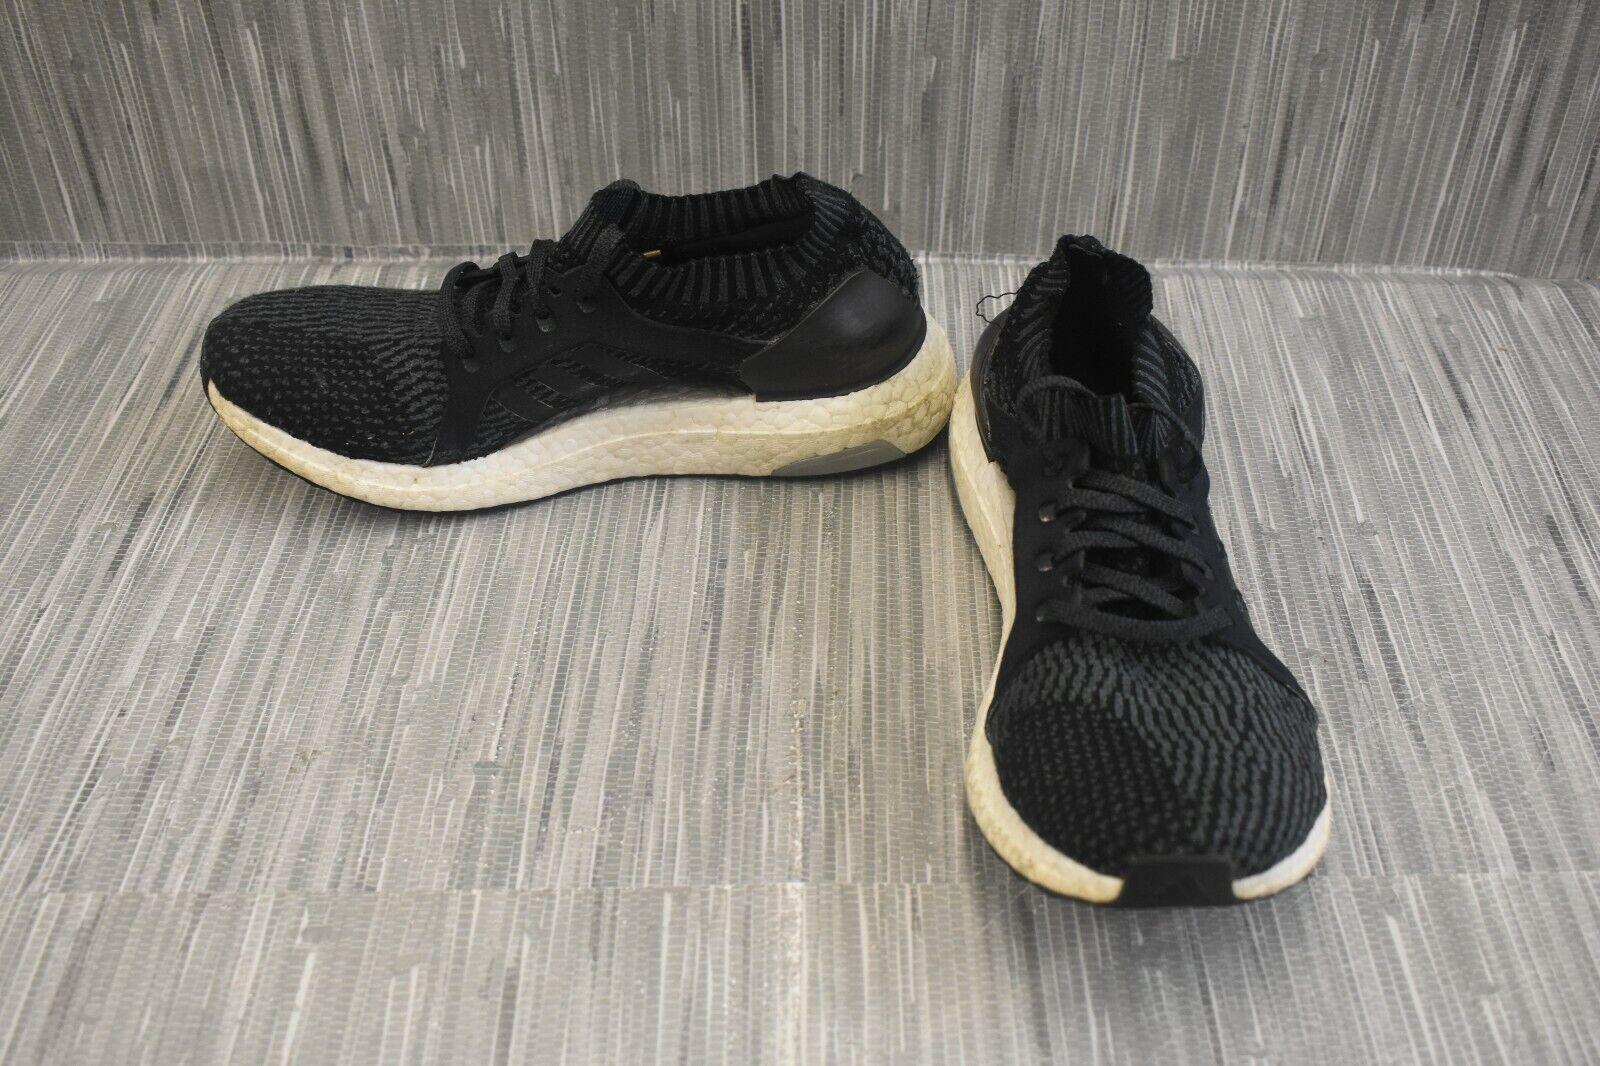 Adidas UltraBOOST X BB1696 Running